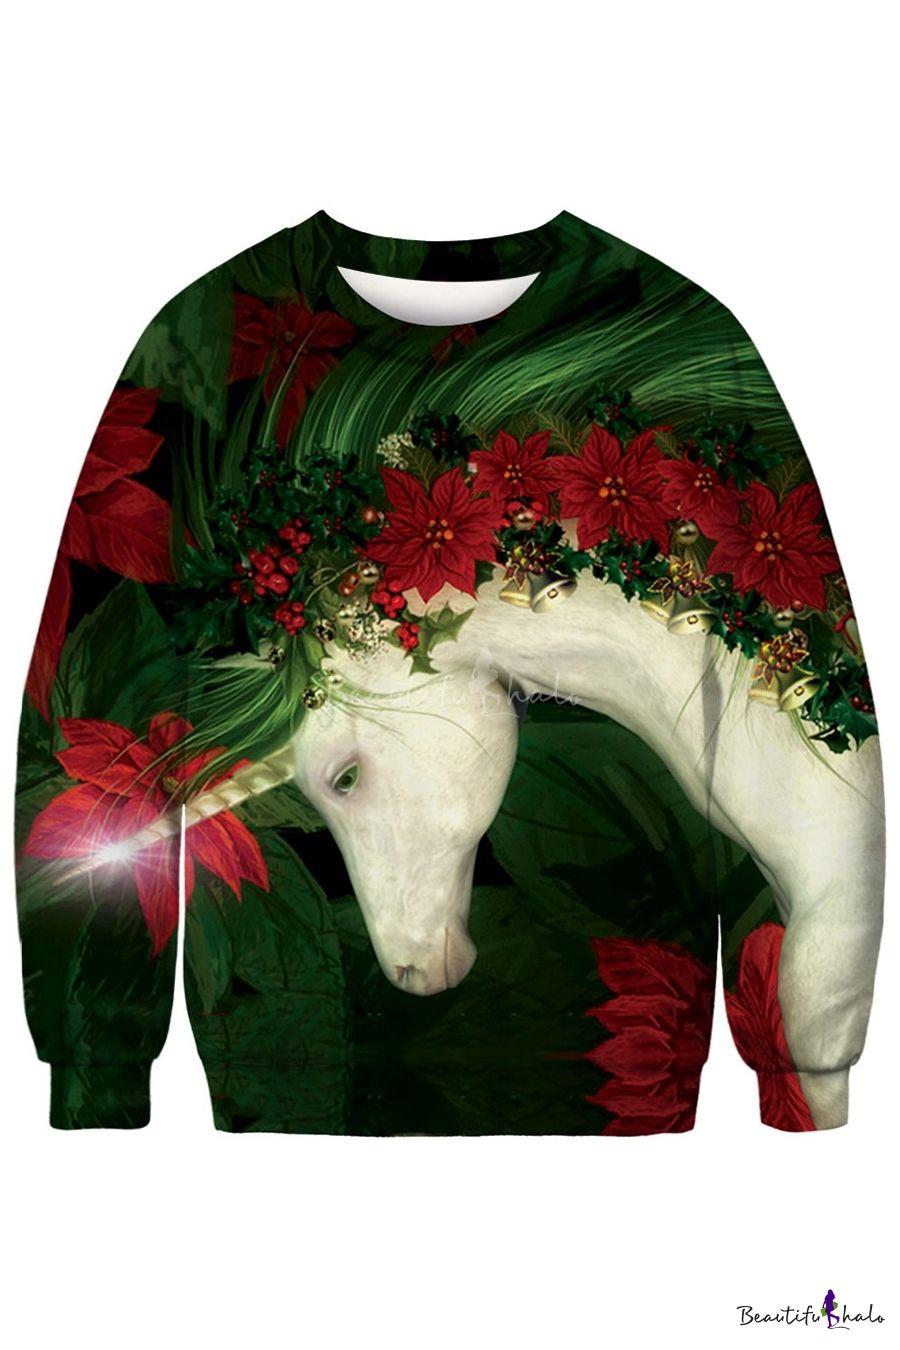 3D Print Sweatshirt O Neck Long Sleeve Pullover Fashionhe Women Christmas Blouse